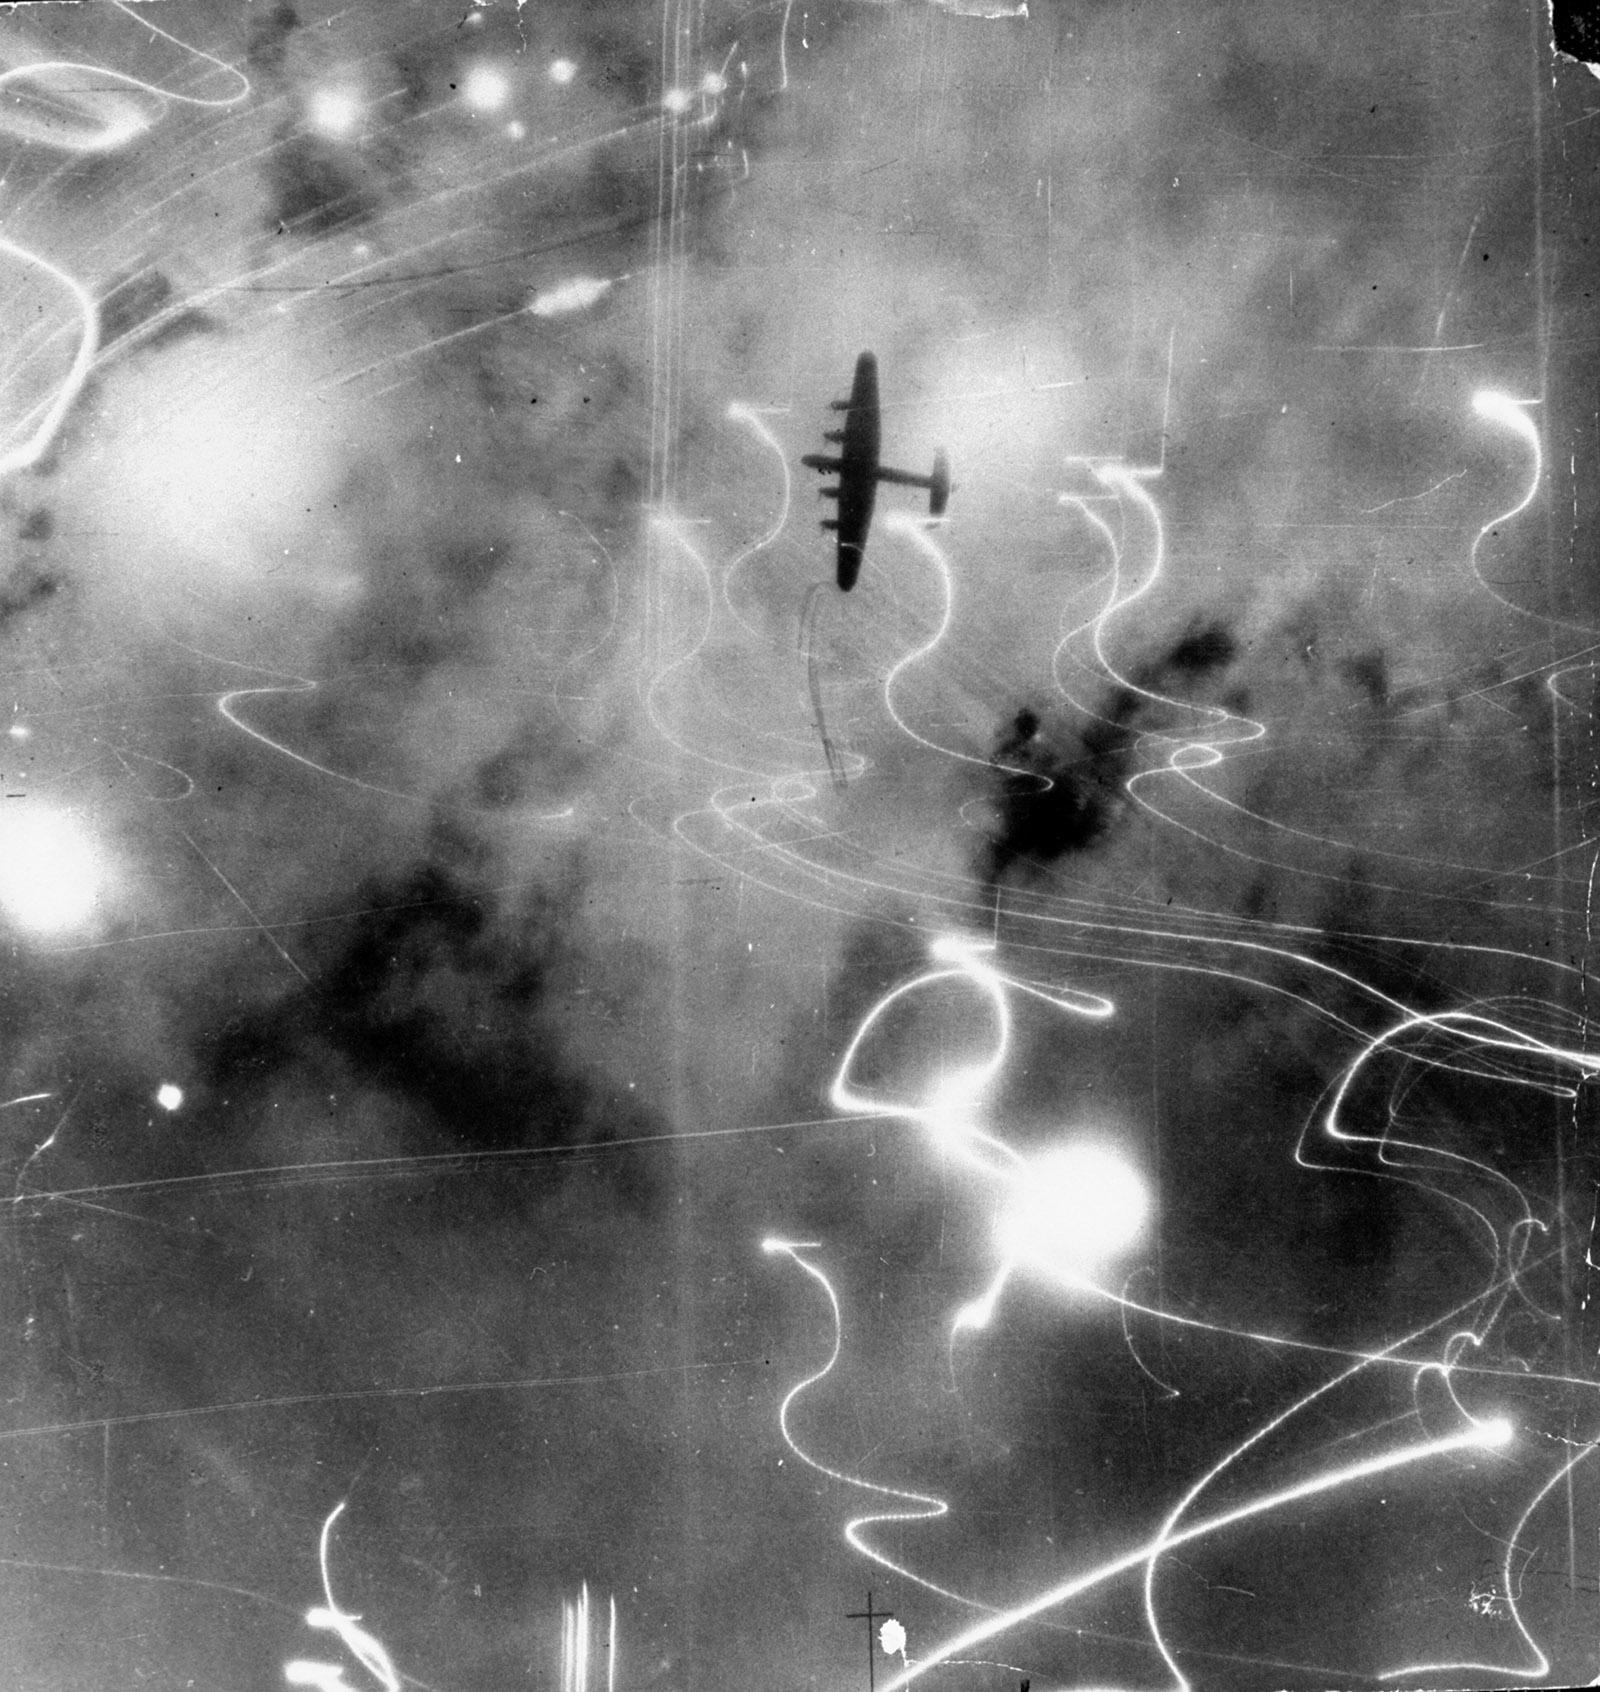 A Royal Air Force Lancaster bomber during a night raid over Hamburg, Germany, 1943